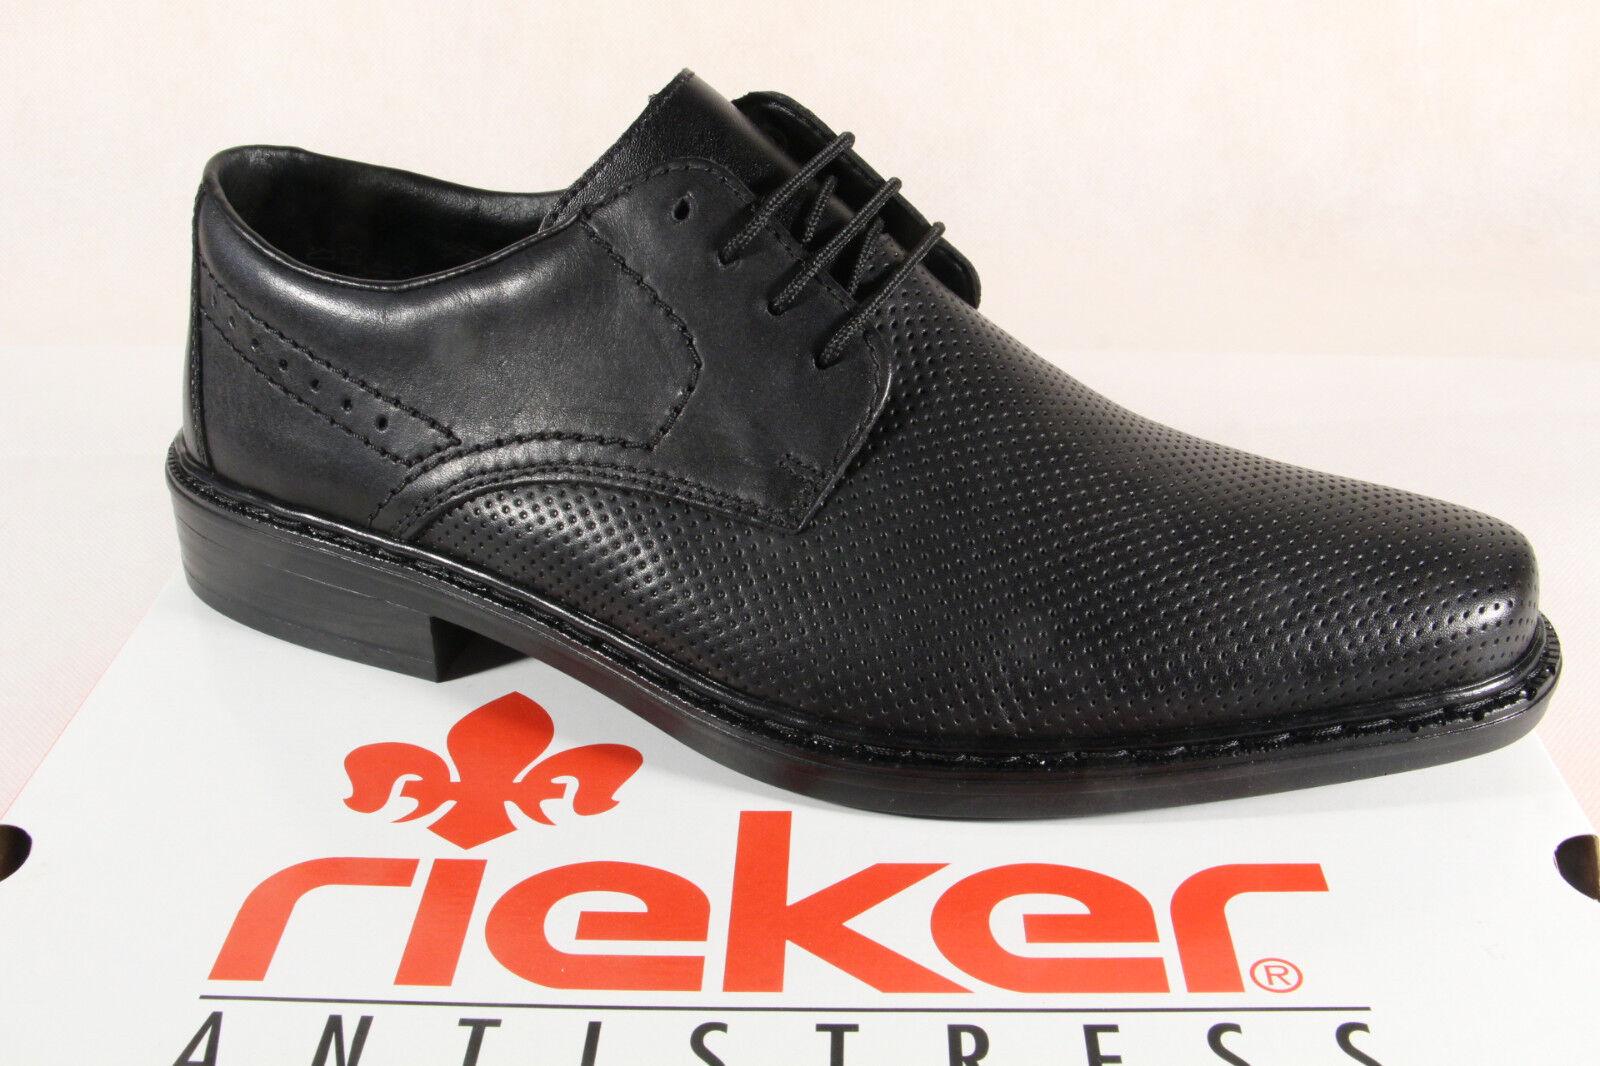 Rieker Halbschuhe Slipper B2319 Schnürschuhe schwarz, Leder B2319 Slipper NEU   e09064